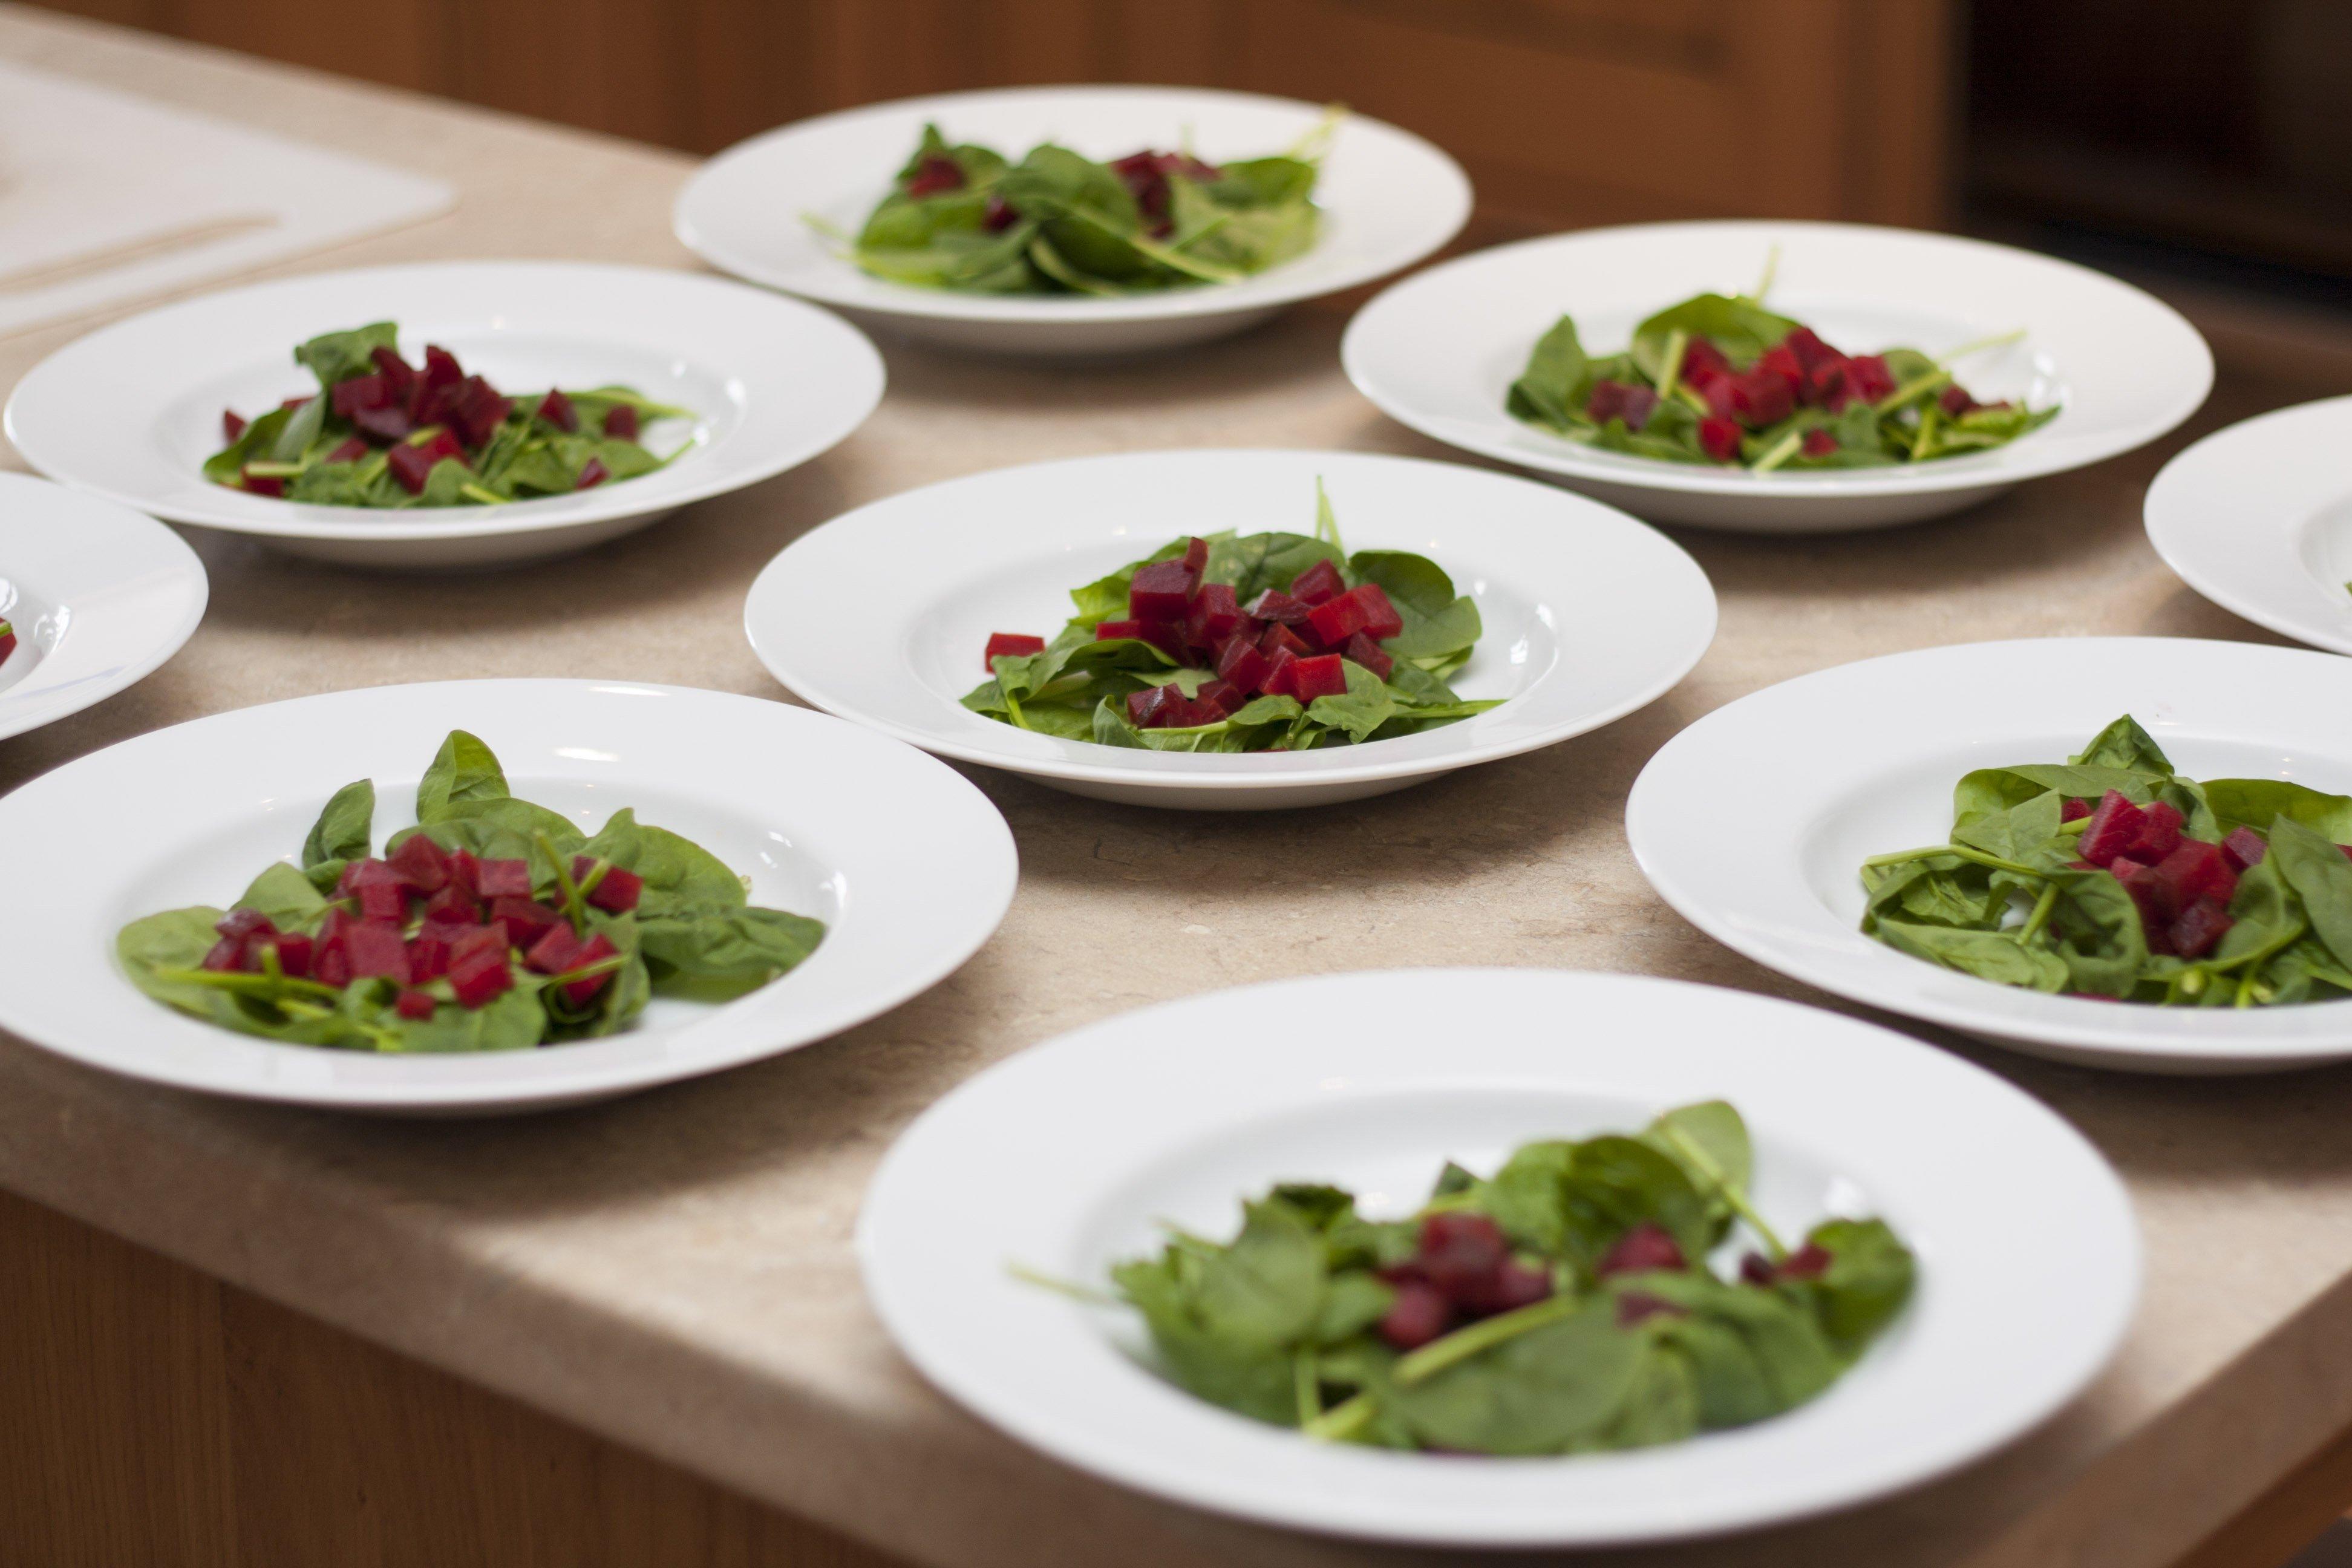 Delicious food on nine plates